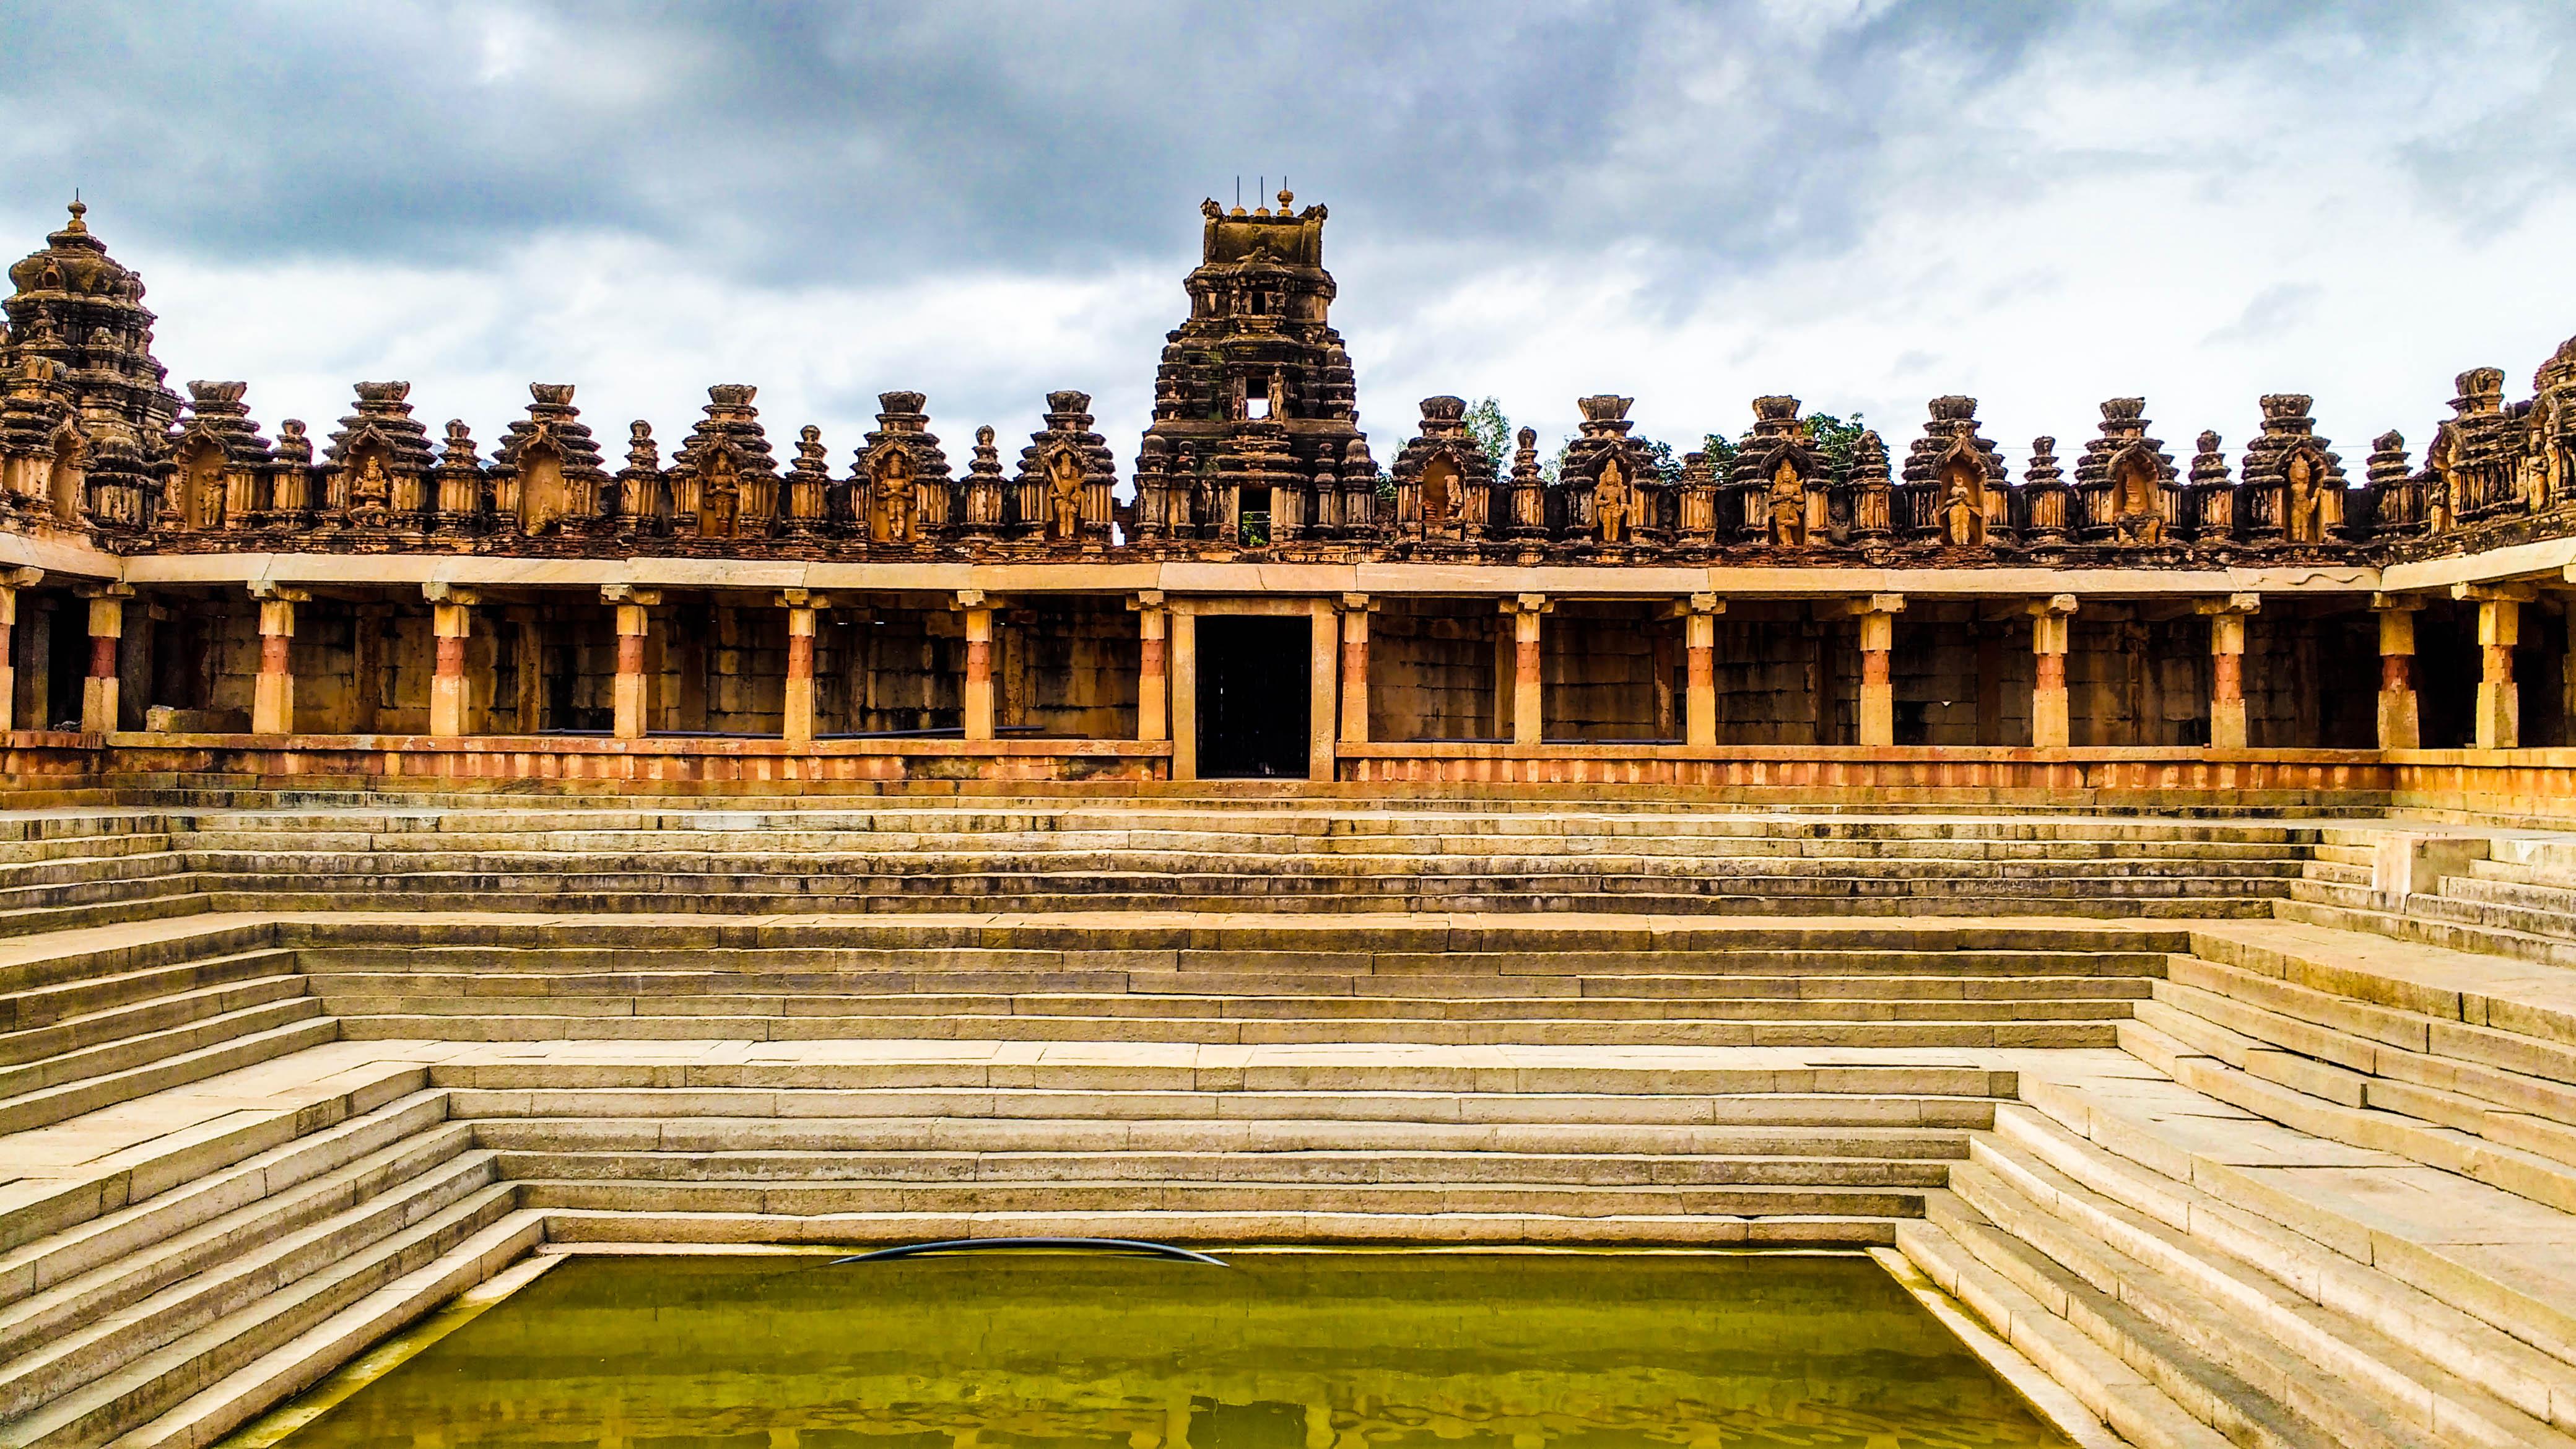 File:Bhoganandishwara temple, Nandi hills 121.jpg - Wikimedia Commons